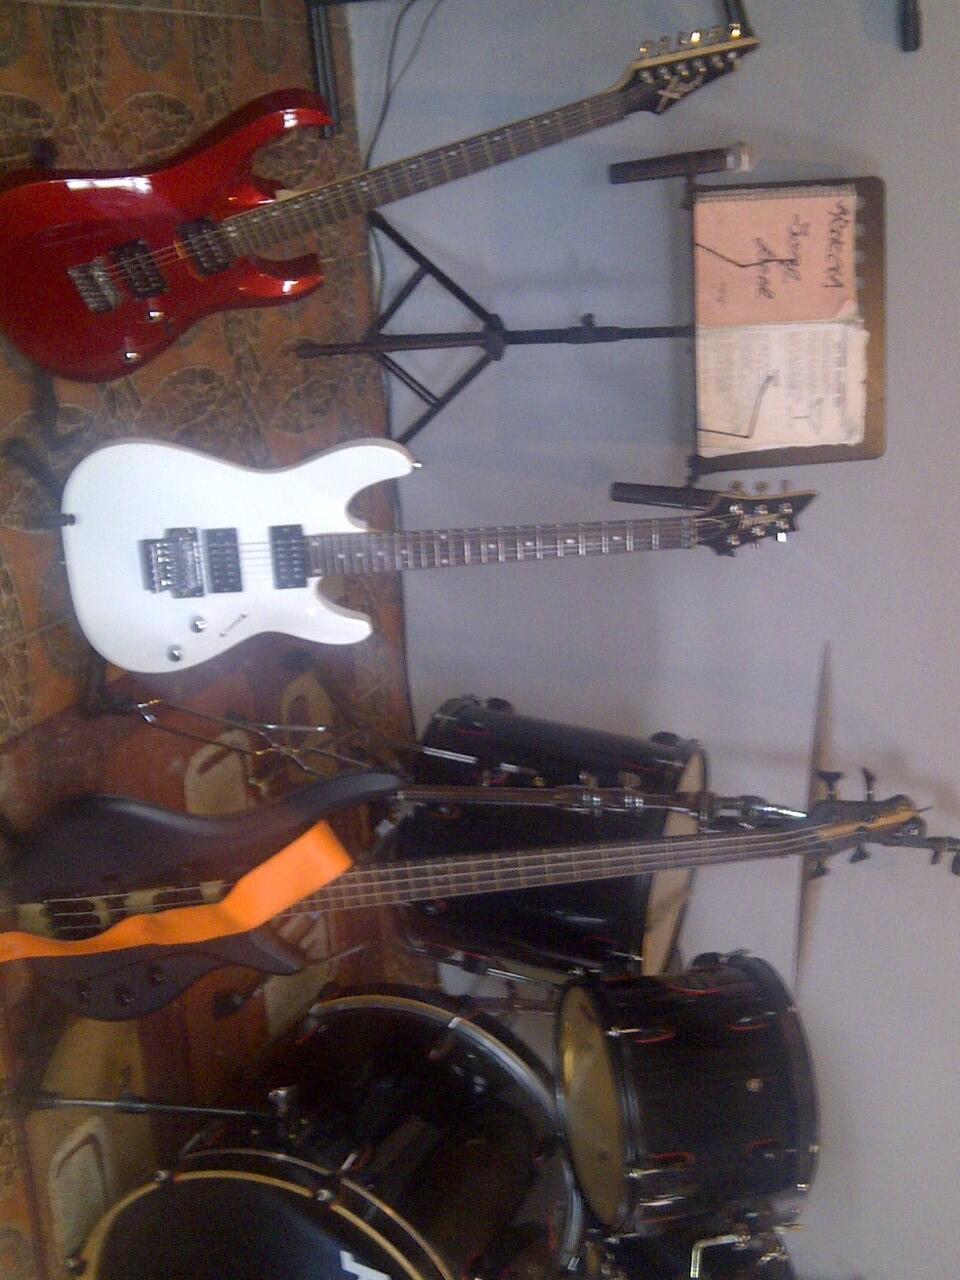 JUAL SATU SET/SATUAN ALAT MUSIK GUITAR ,BASS,DRUM ,KEYBOARD,SOUND SYSTEM